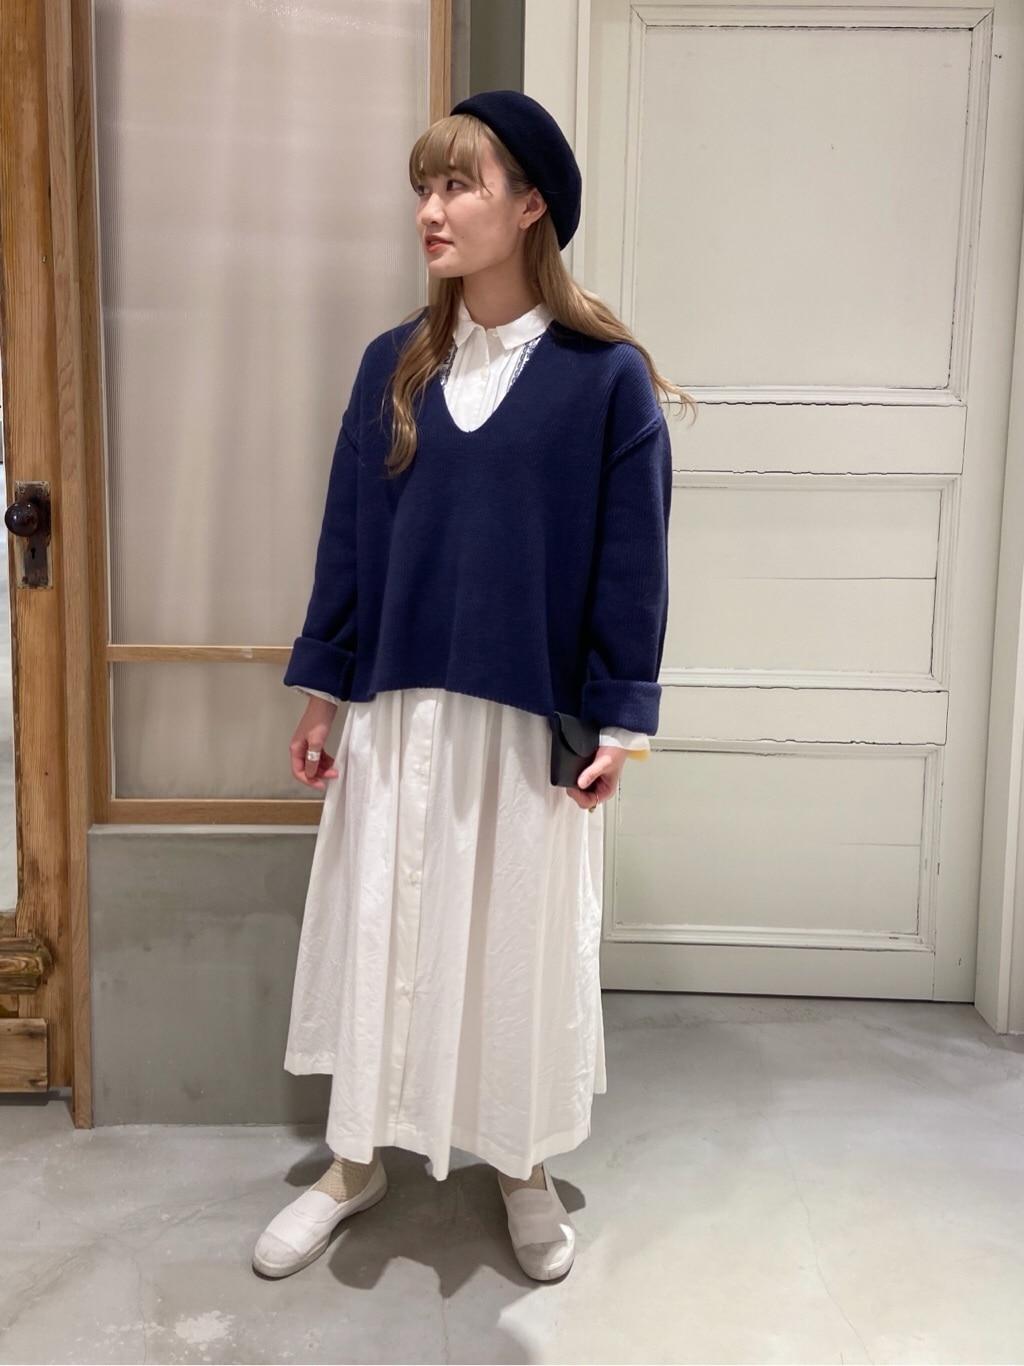 bulle de savon 渋谷スクランブルスクエア 身長:160cm 2020.12.24